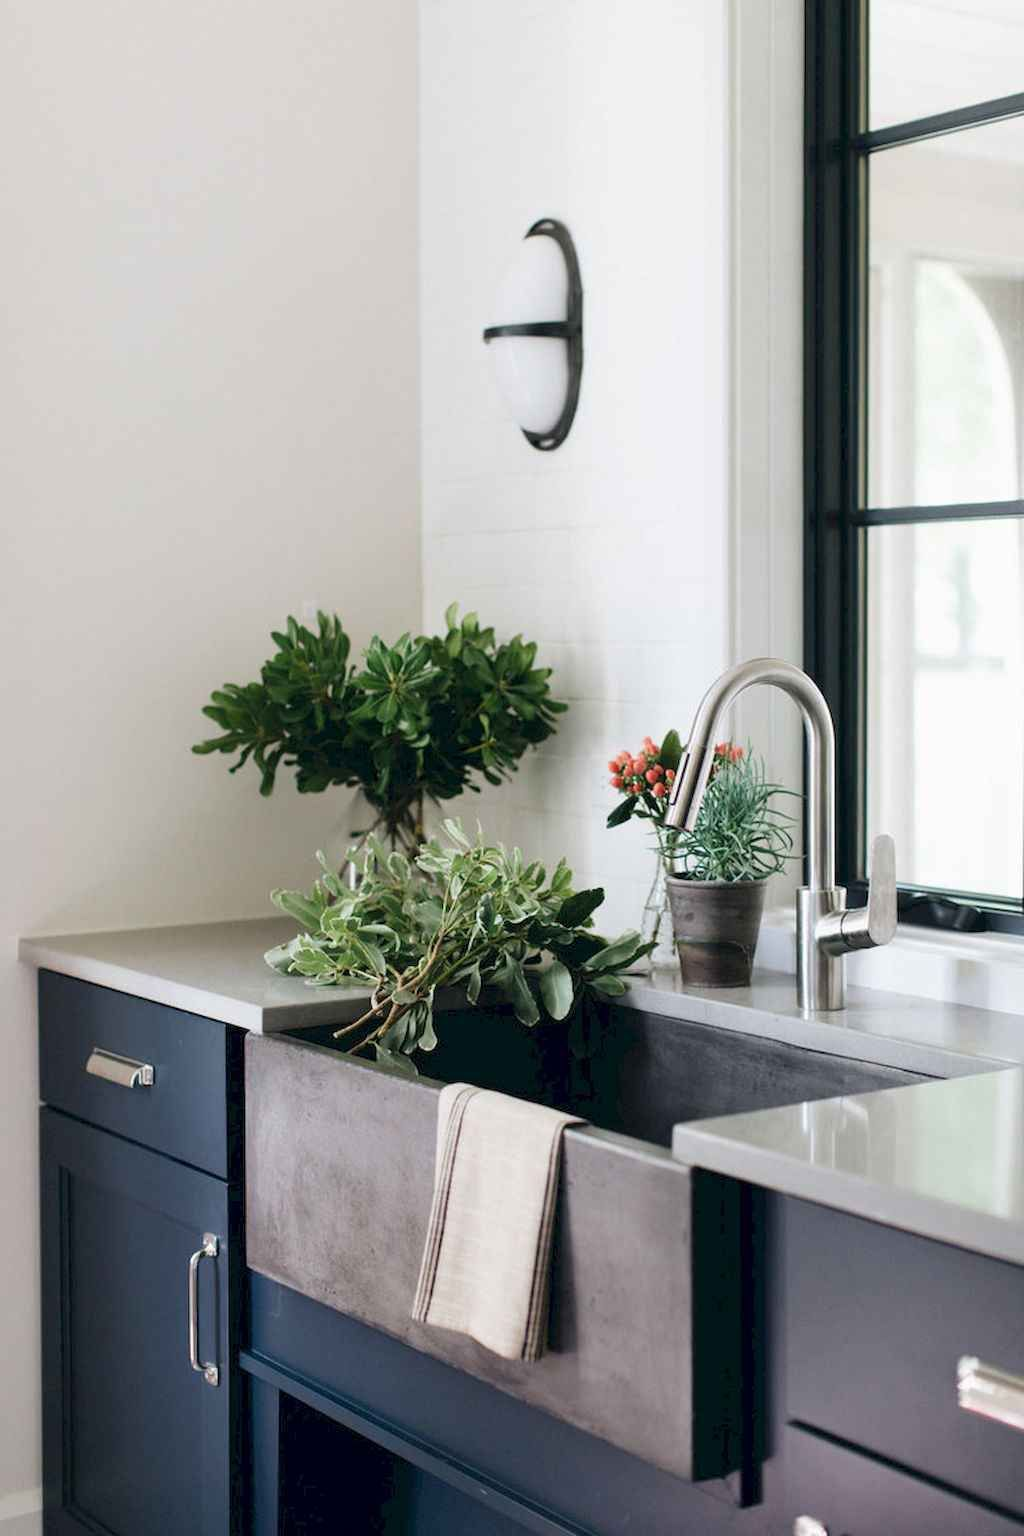 55 best rustic kitchen sink farmhouse style ideas rustic kitchen sinks rustic kitchen on kitchen sink ideas id=44009